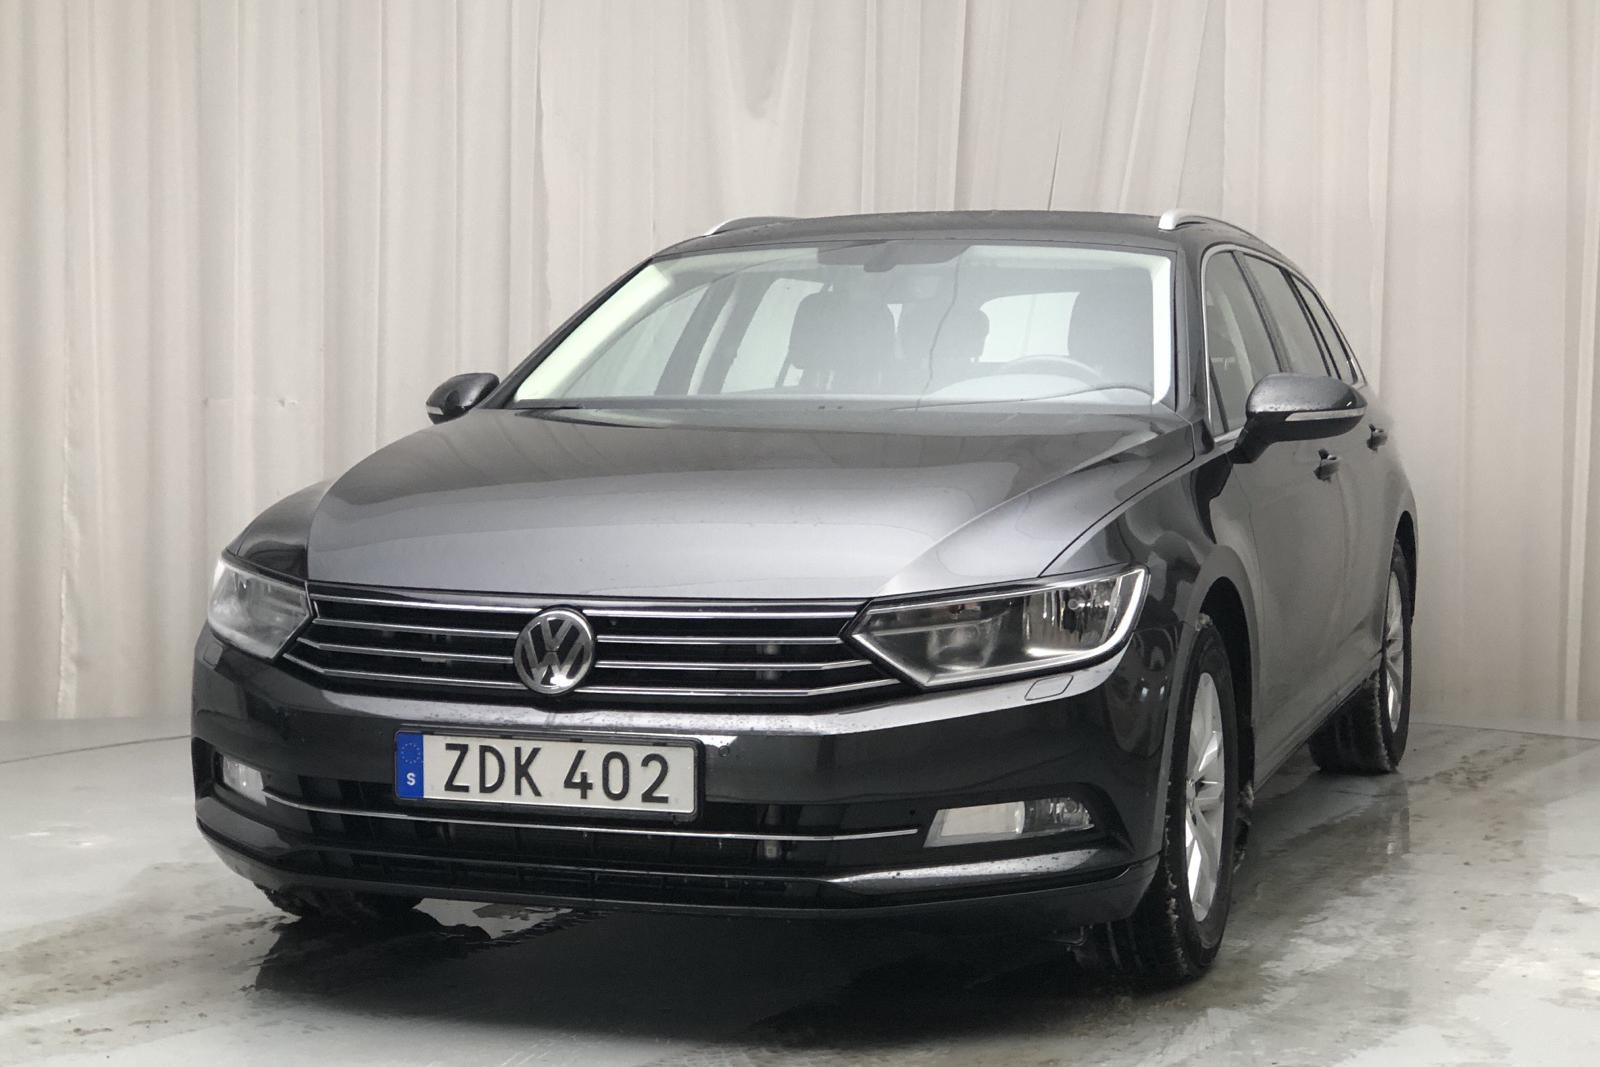 VW Passat 1.4 TSI Sportscombi (150hk) - 4 147 mil - Automat - Dark Grey - 2018